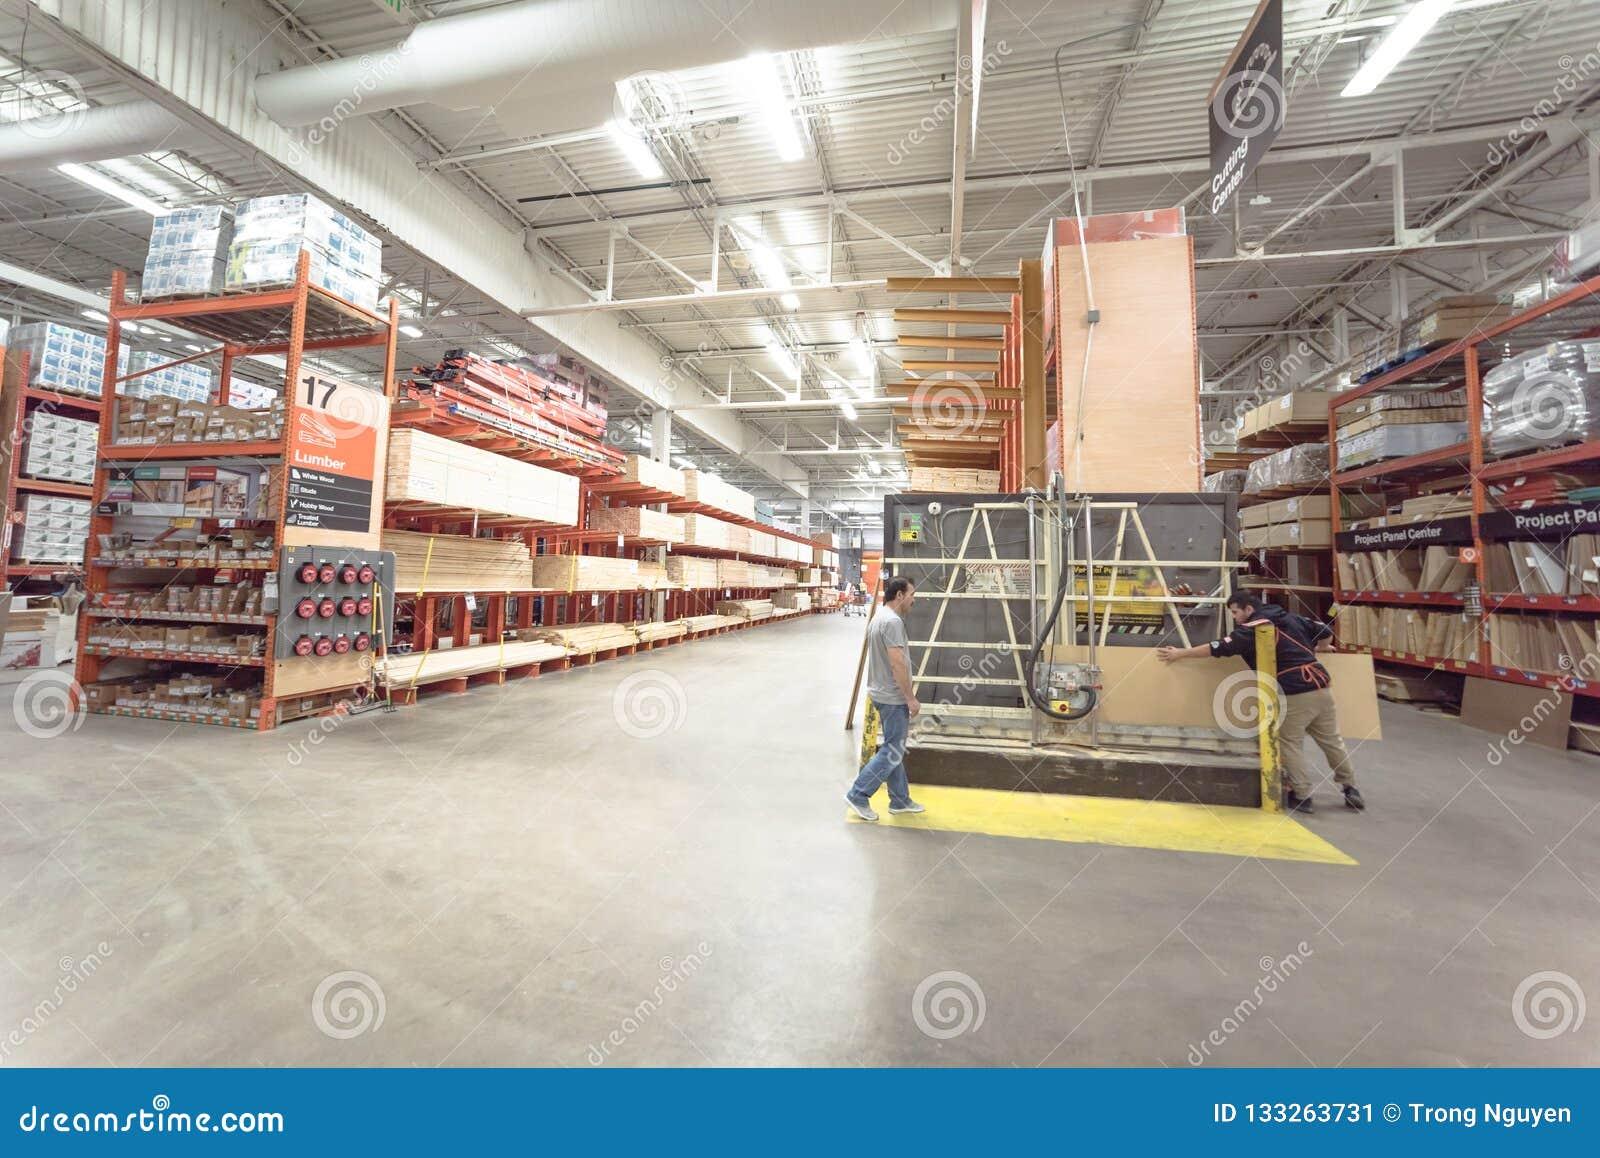 Home Depot Employee Services >> Home Depot Staff Helping Customer Cutting Wood Lumber